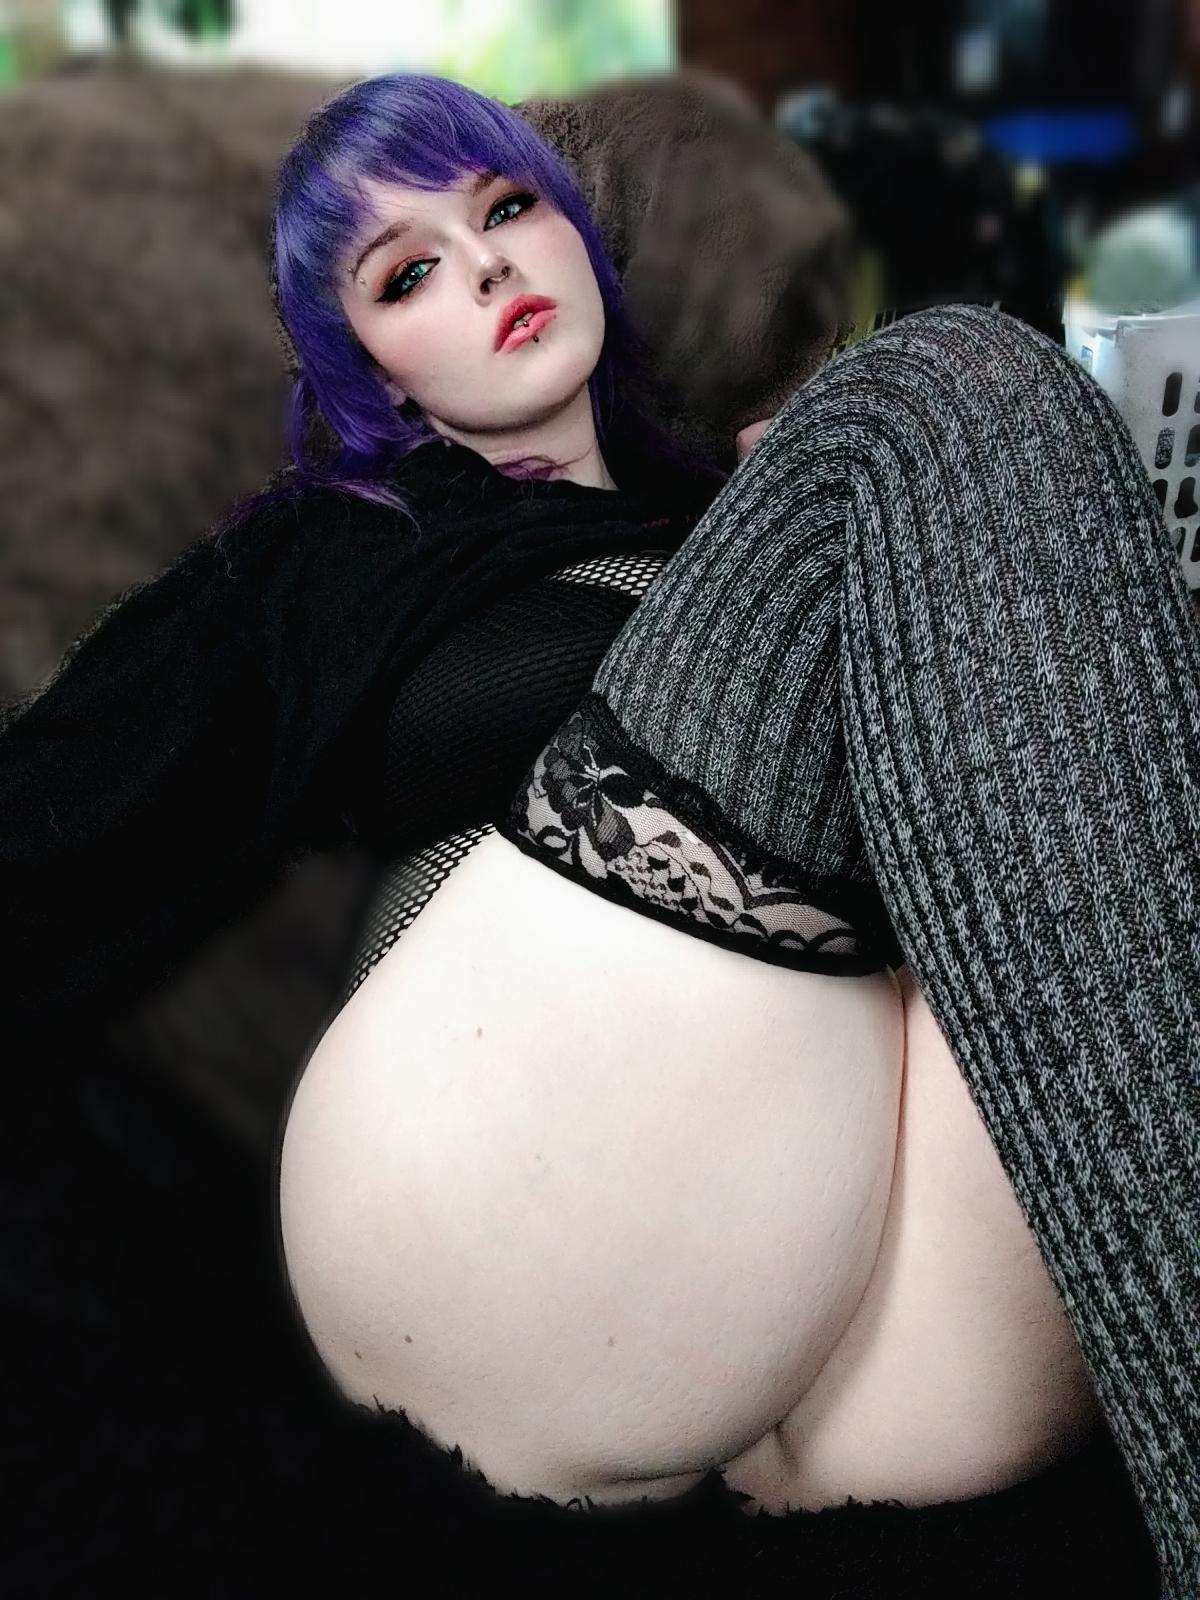 Poofychan's Slutty Goth E Girl Cosplay 0056